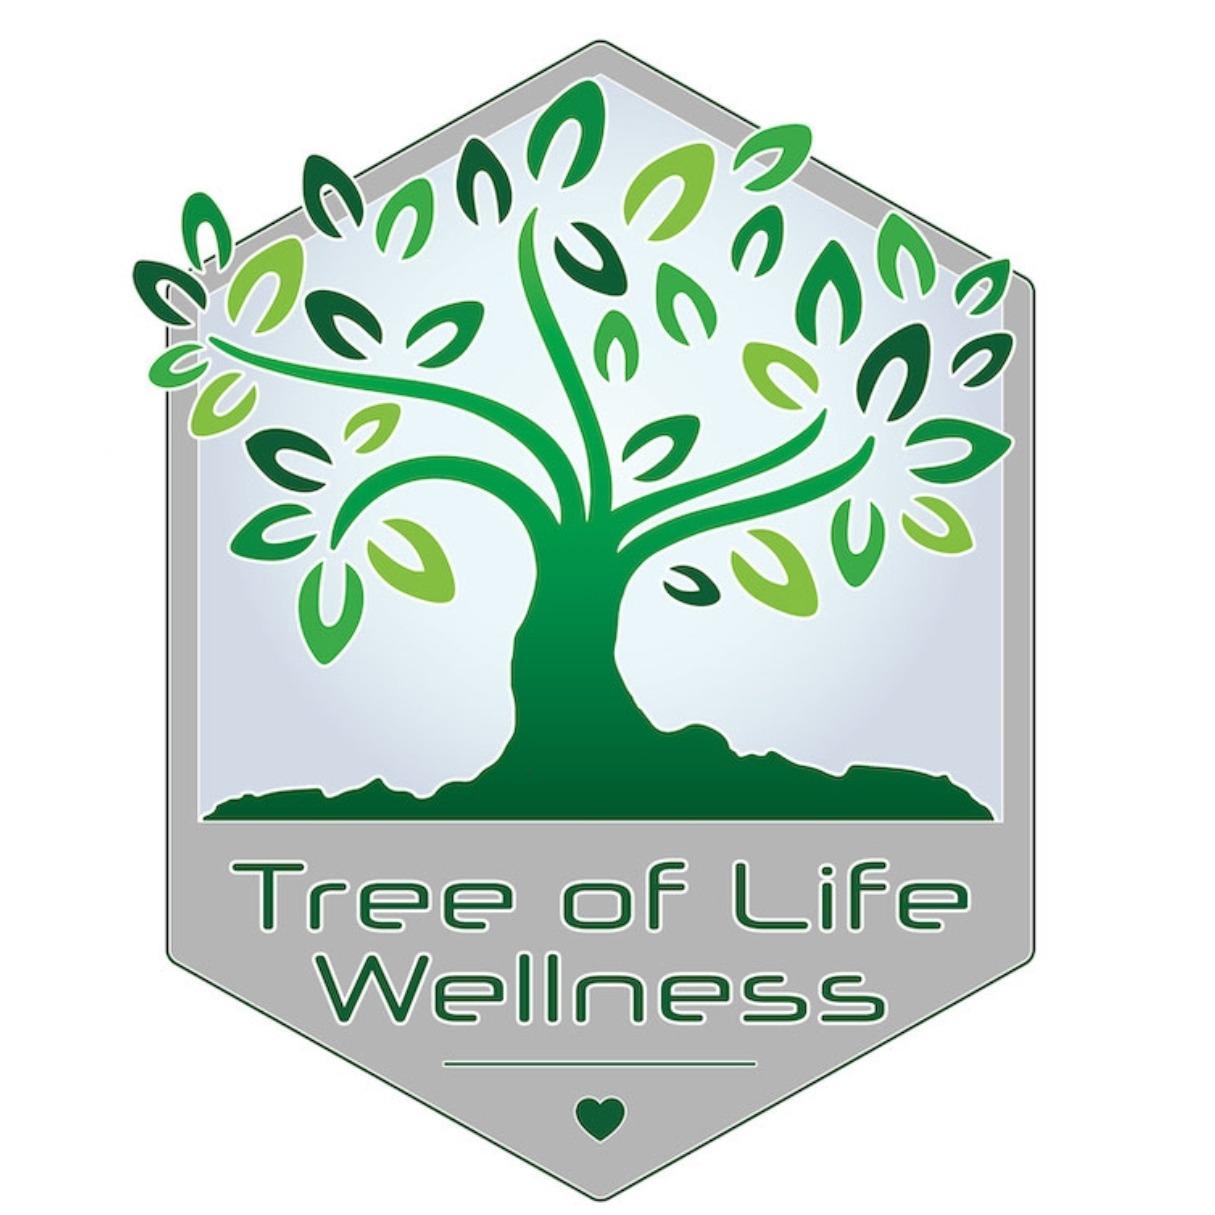 Tree of Life Wellness